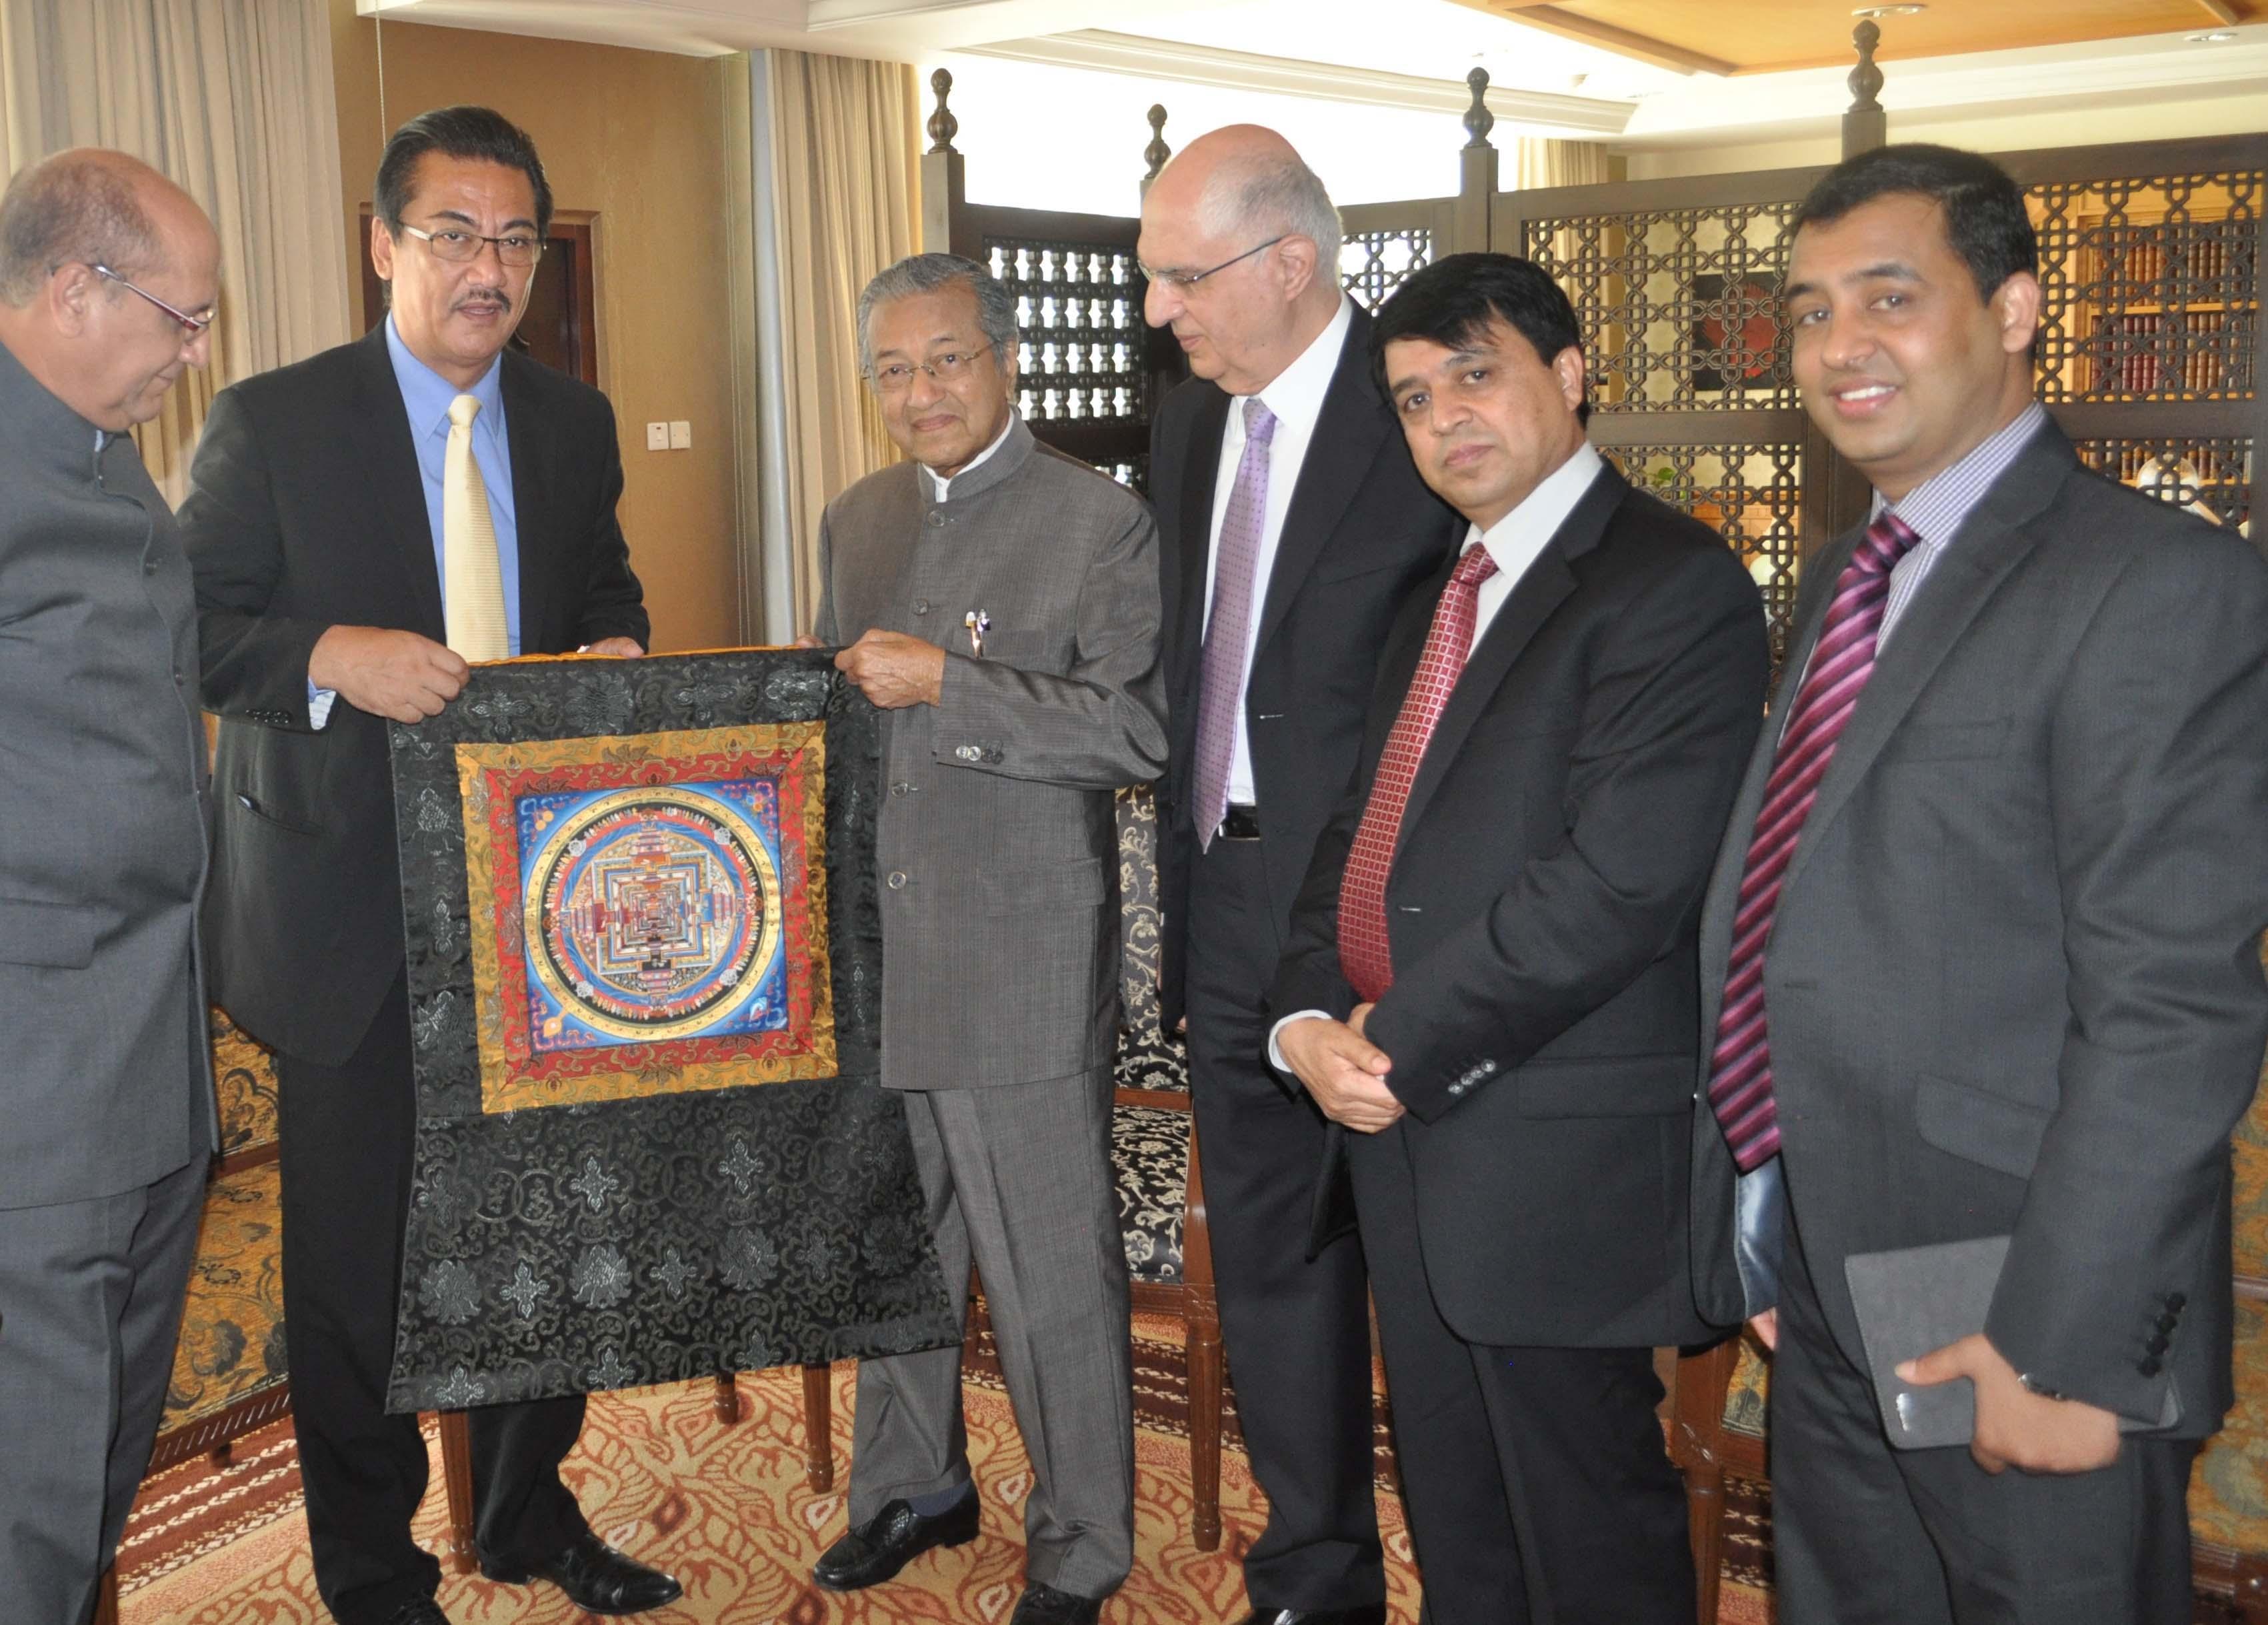 FNCCI invites Mahathir to take part in Nepal Economic Summit